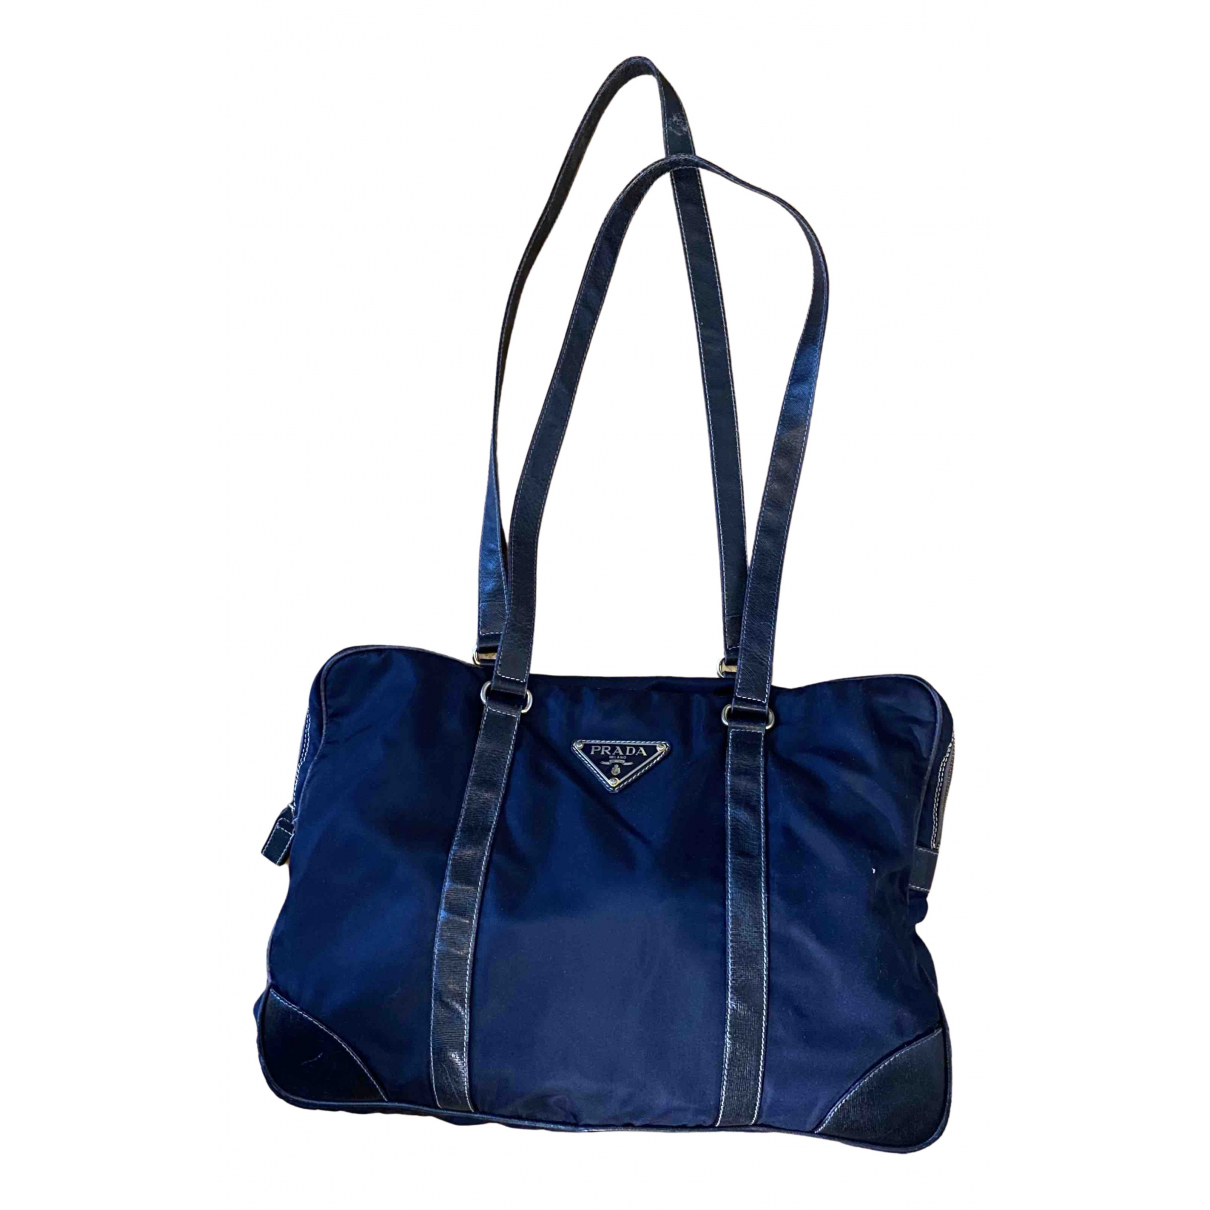 Prada - Sac a main Tessuto city pour femme en toile - bleu